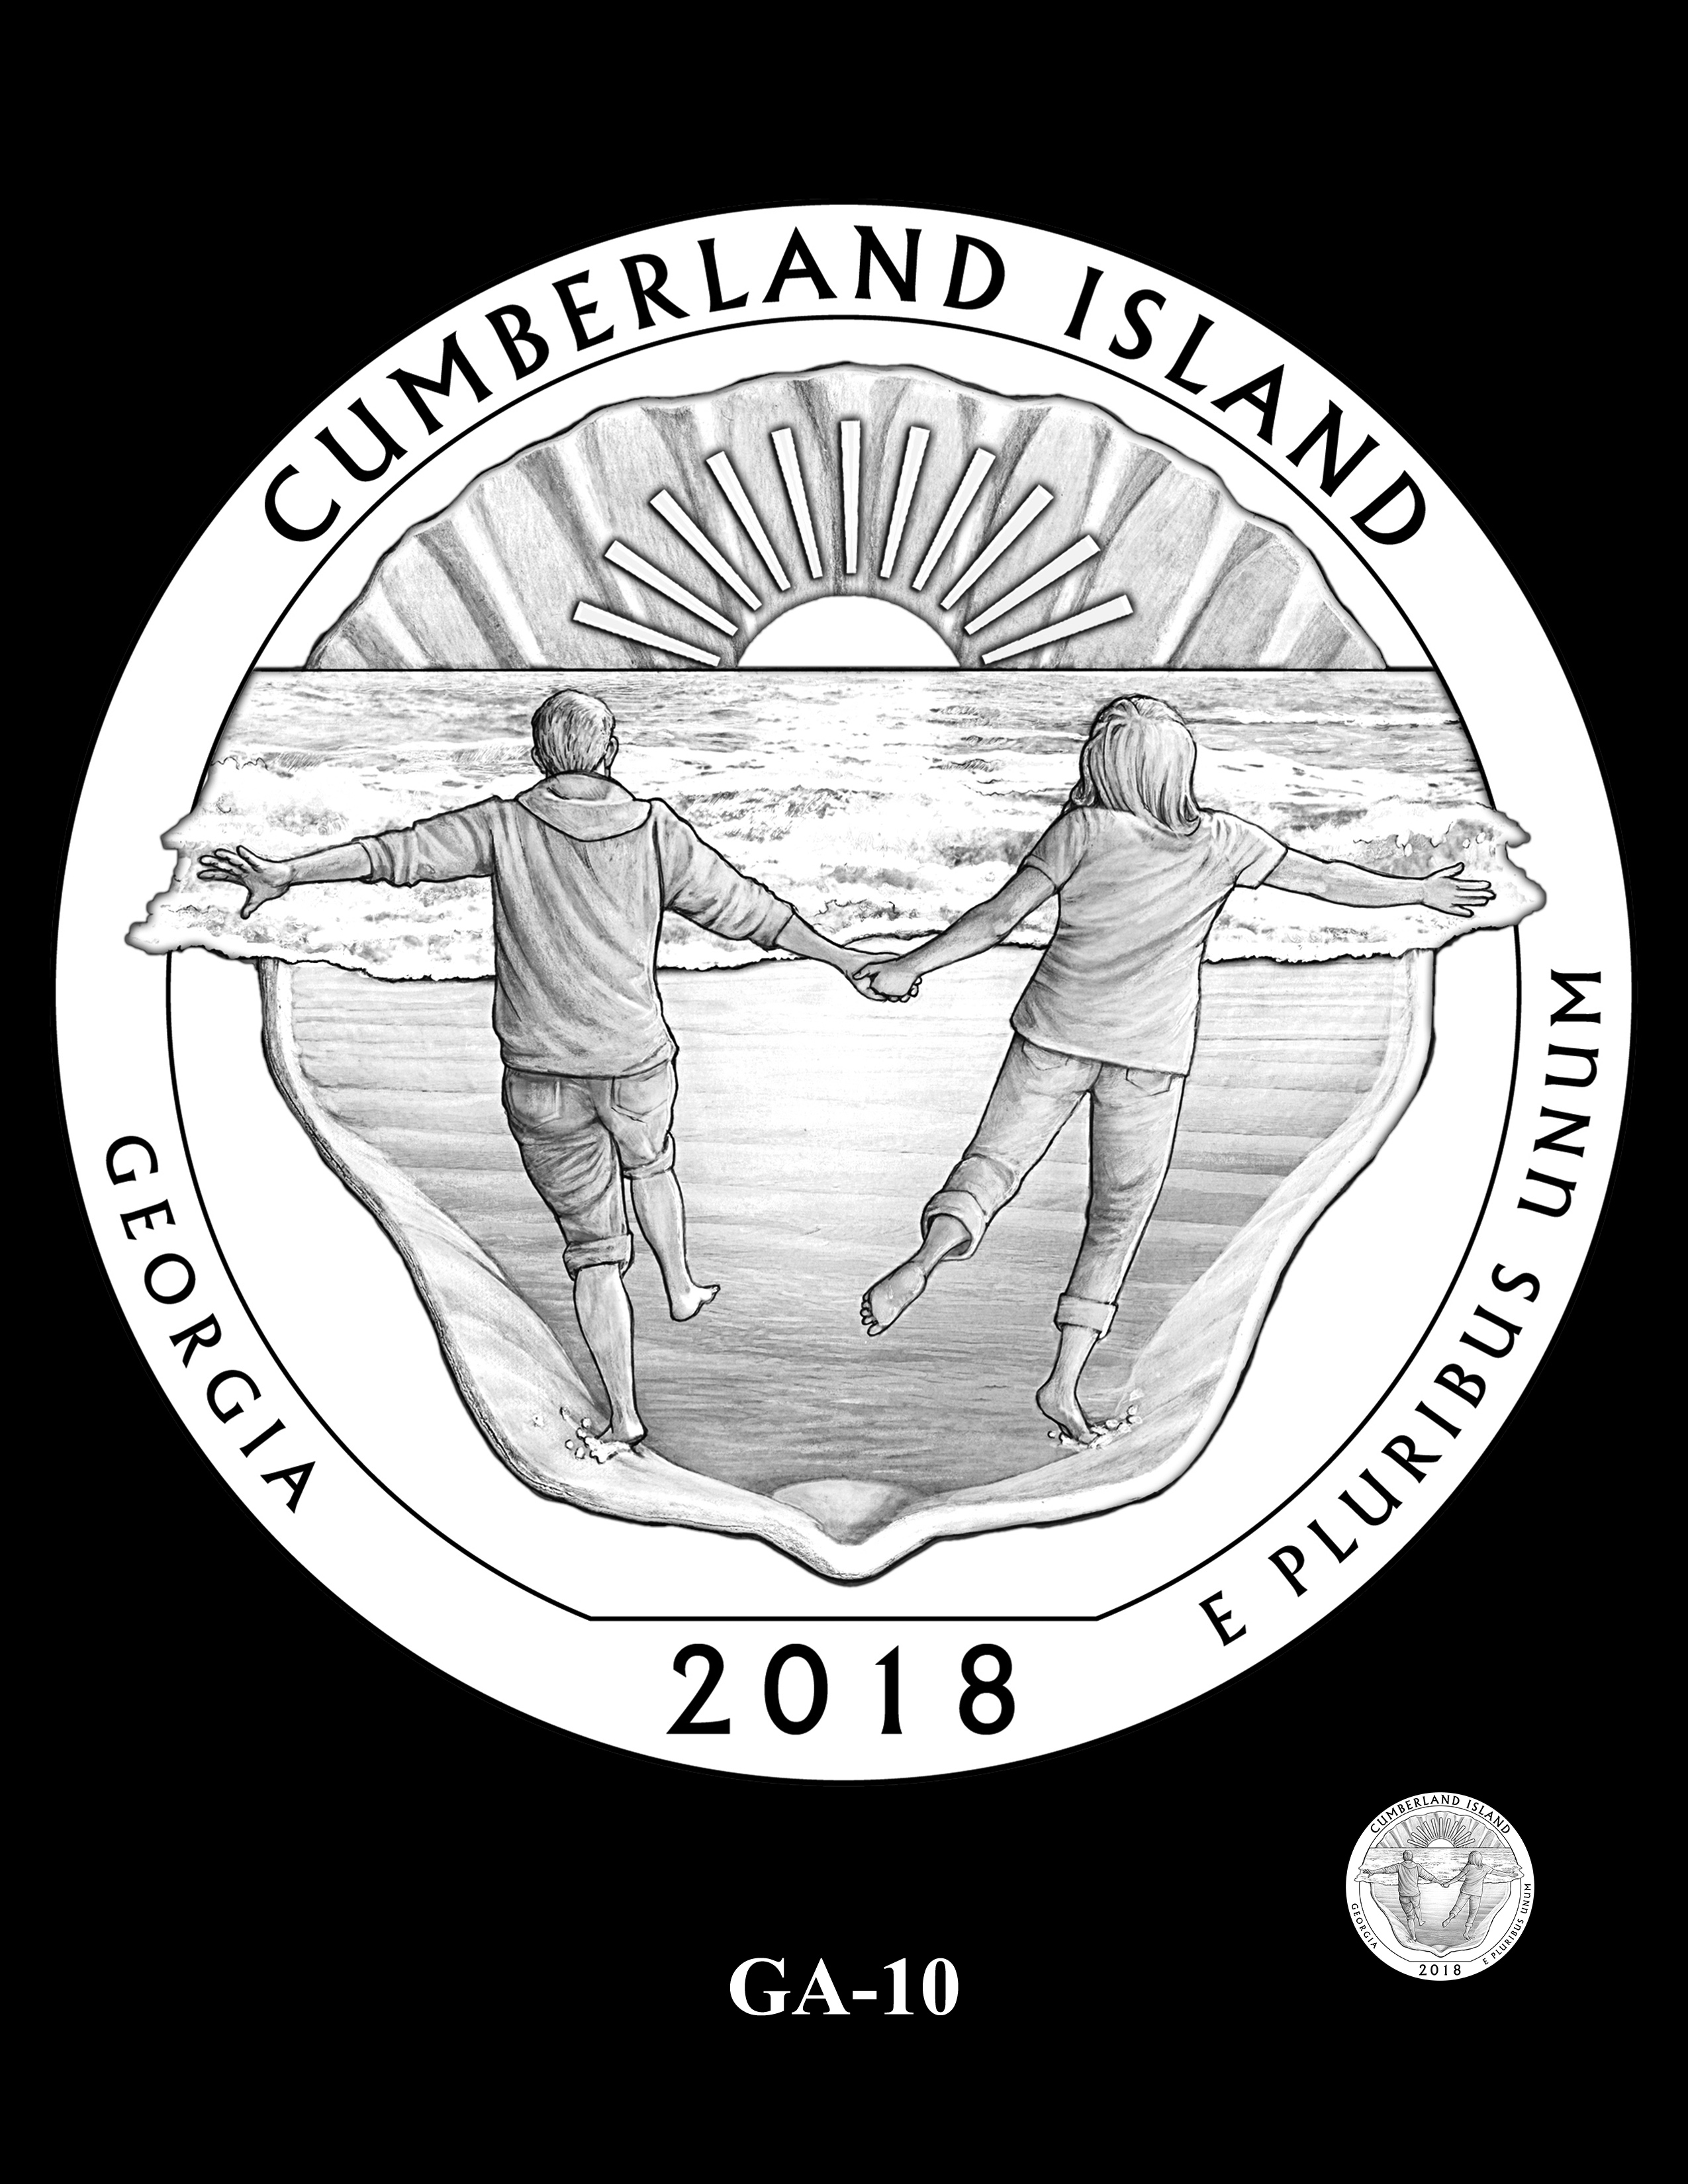 GA-10 -- 2018 America the Beautiful® Quarters Program